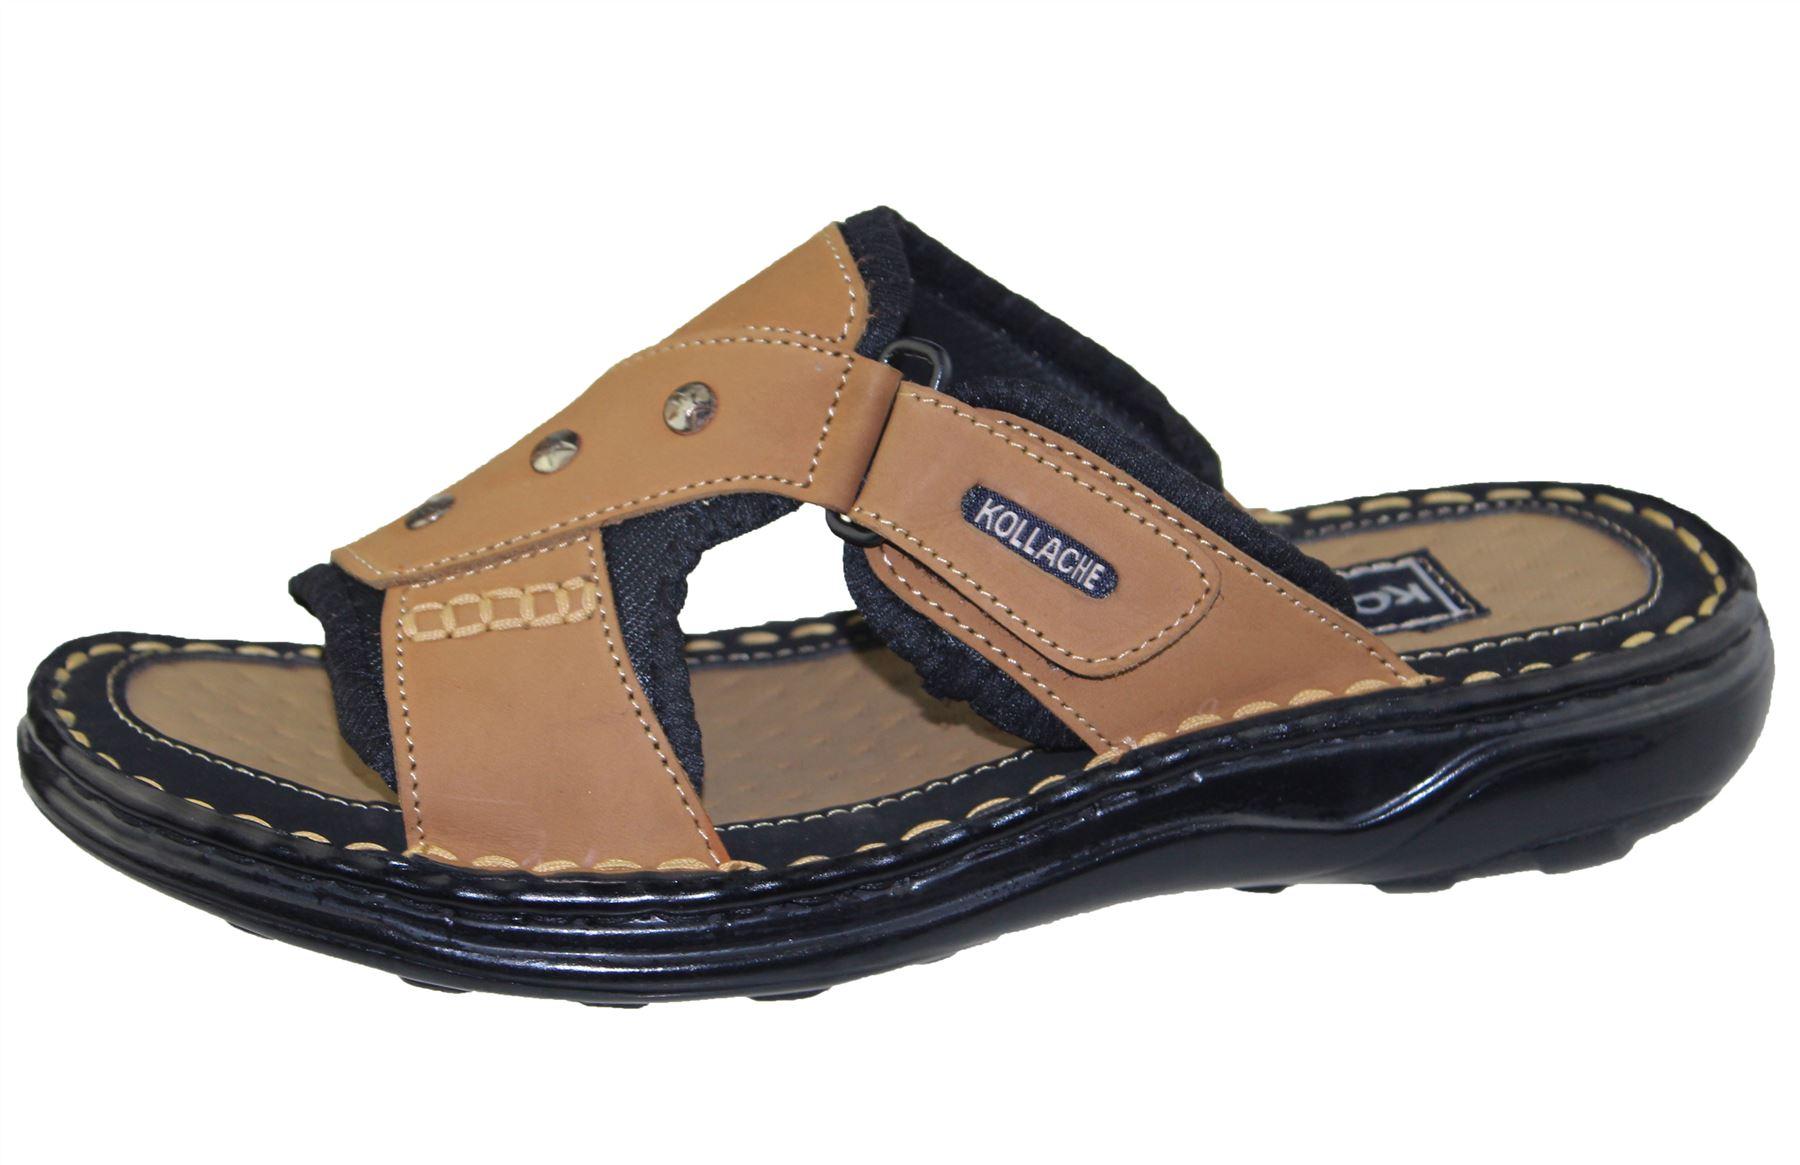 Mens Slipper Sports Sandal Buckle Beach Walking Fashion Summer ... a4f0fd48259